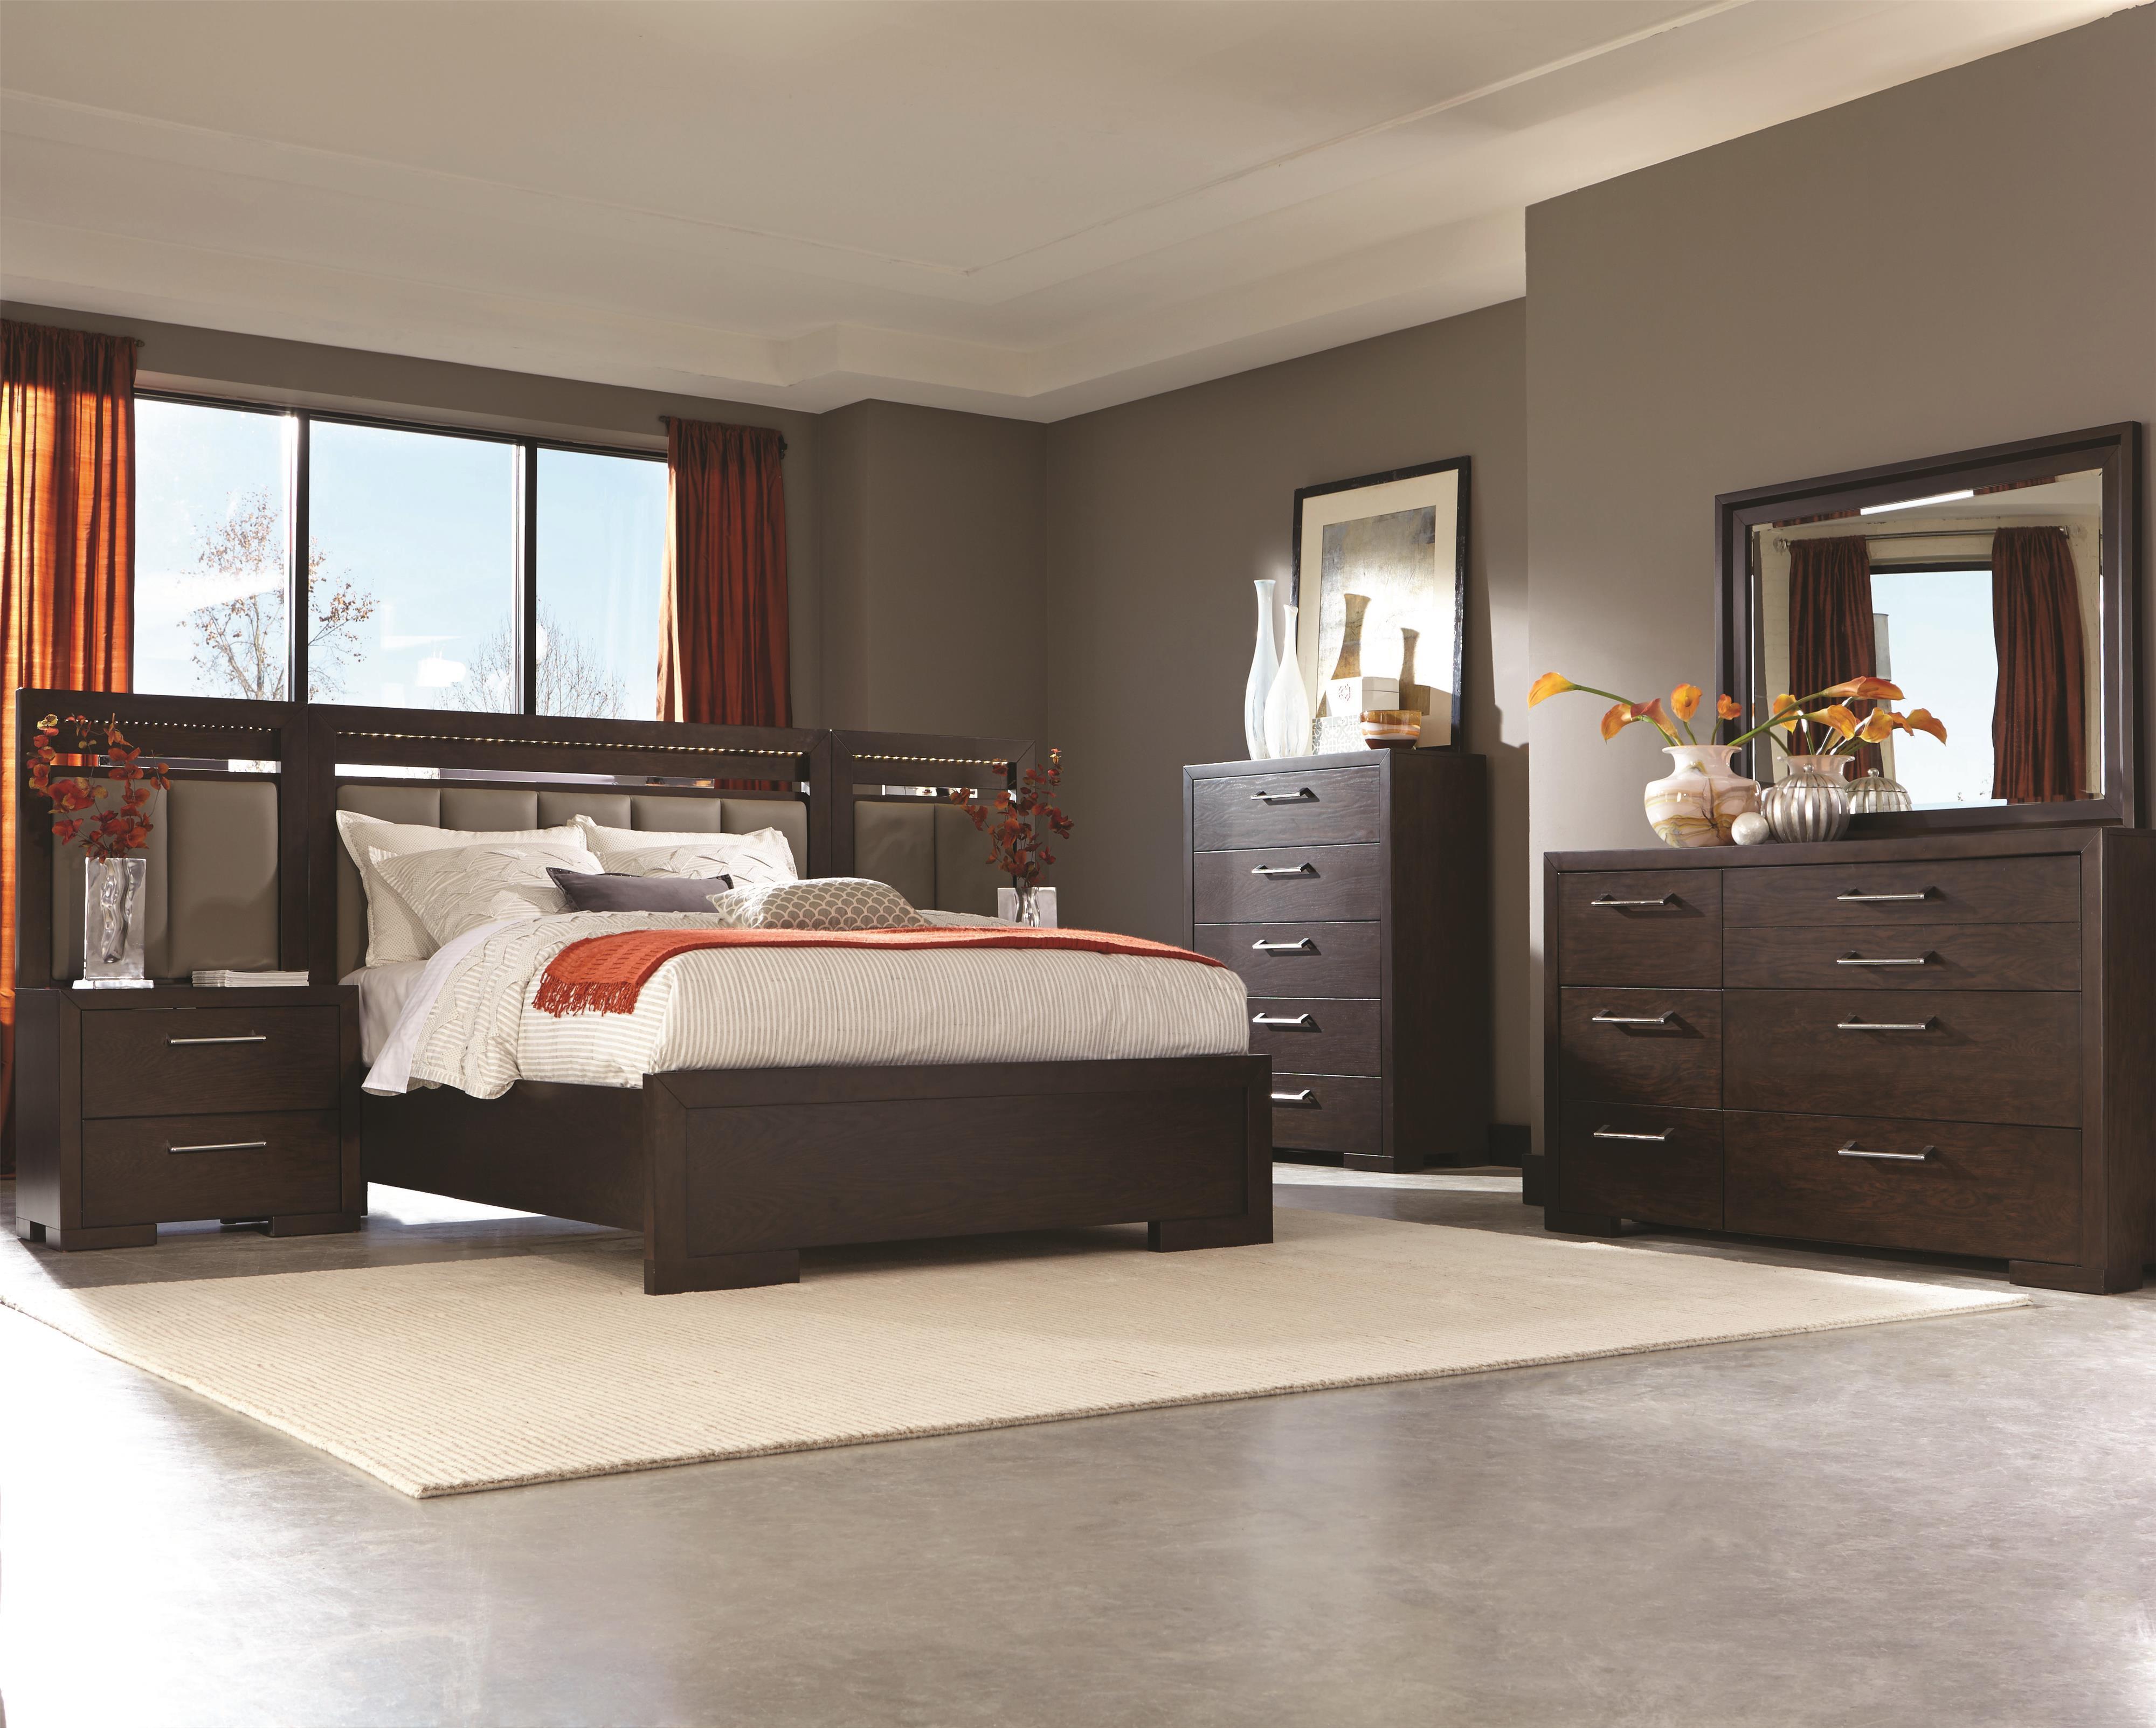 Coaster Berkshire California King Bedroom Group 1 - Item Number: 20446 CK Bedroom Group 1